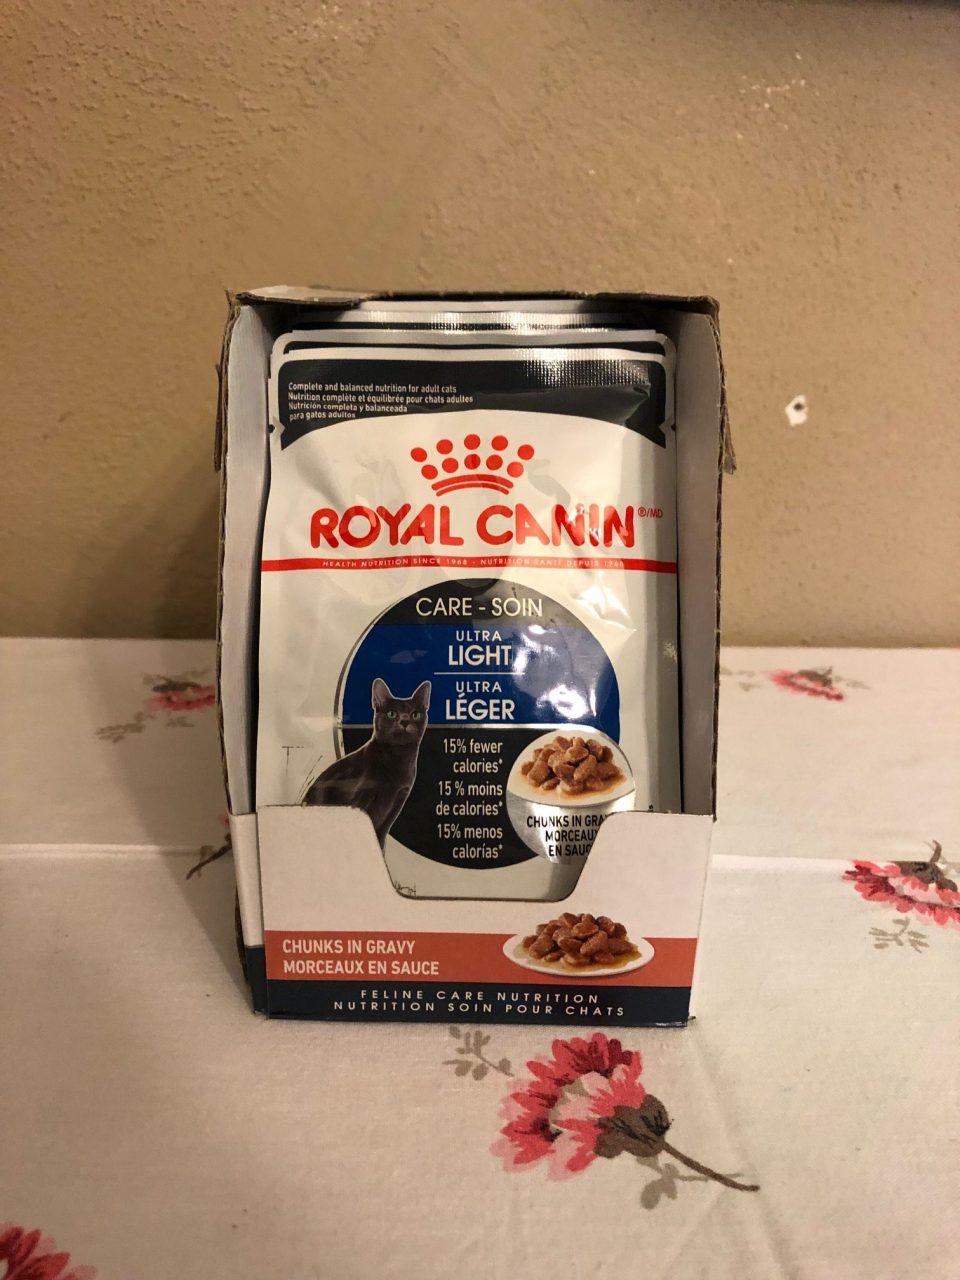 Royal Canin Ultra Light Chunks in Gravy #ChewyInfluencer